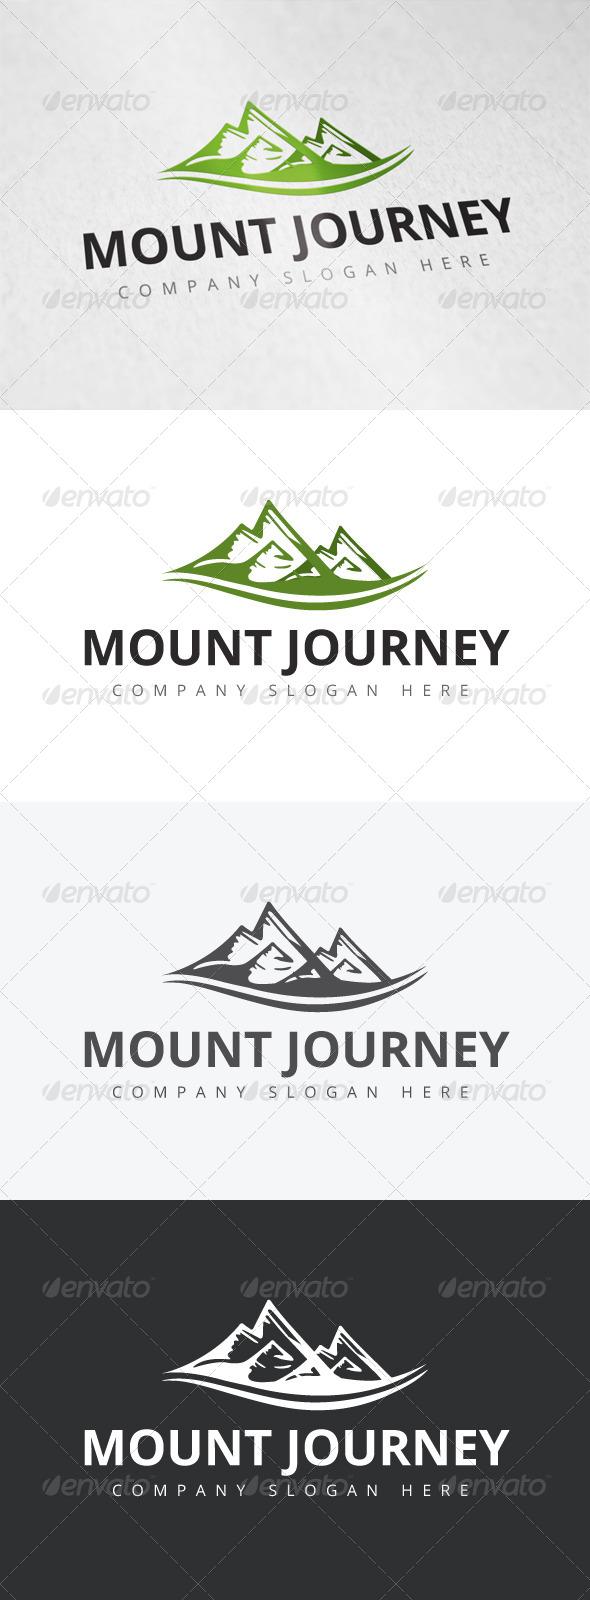 GraphicRiver Mount Journey Logo 7921669